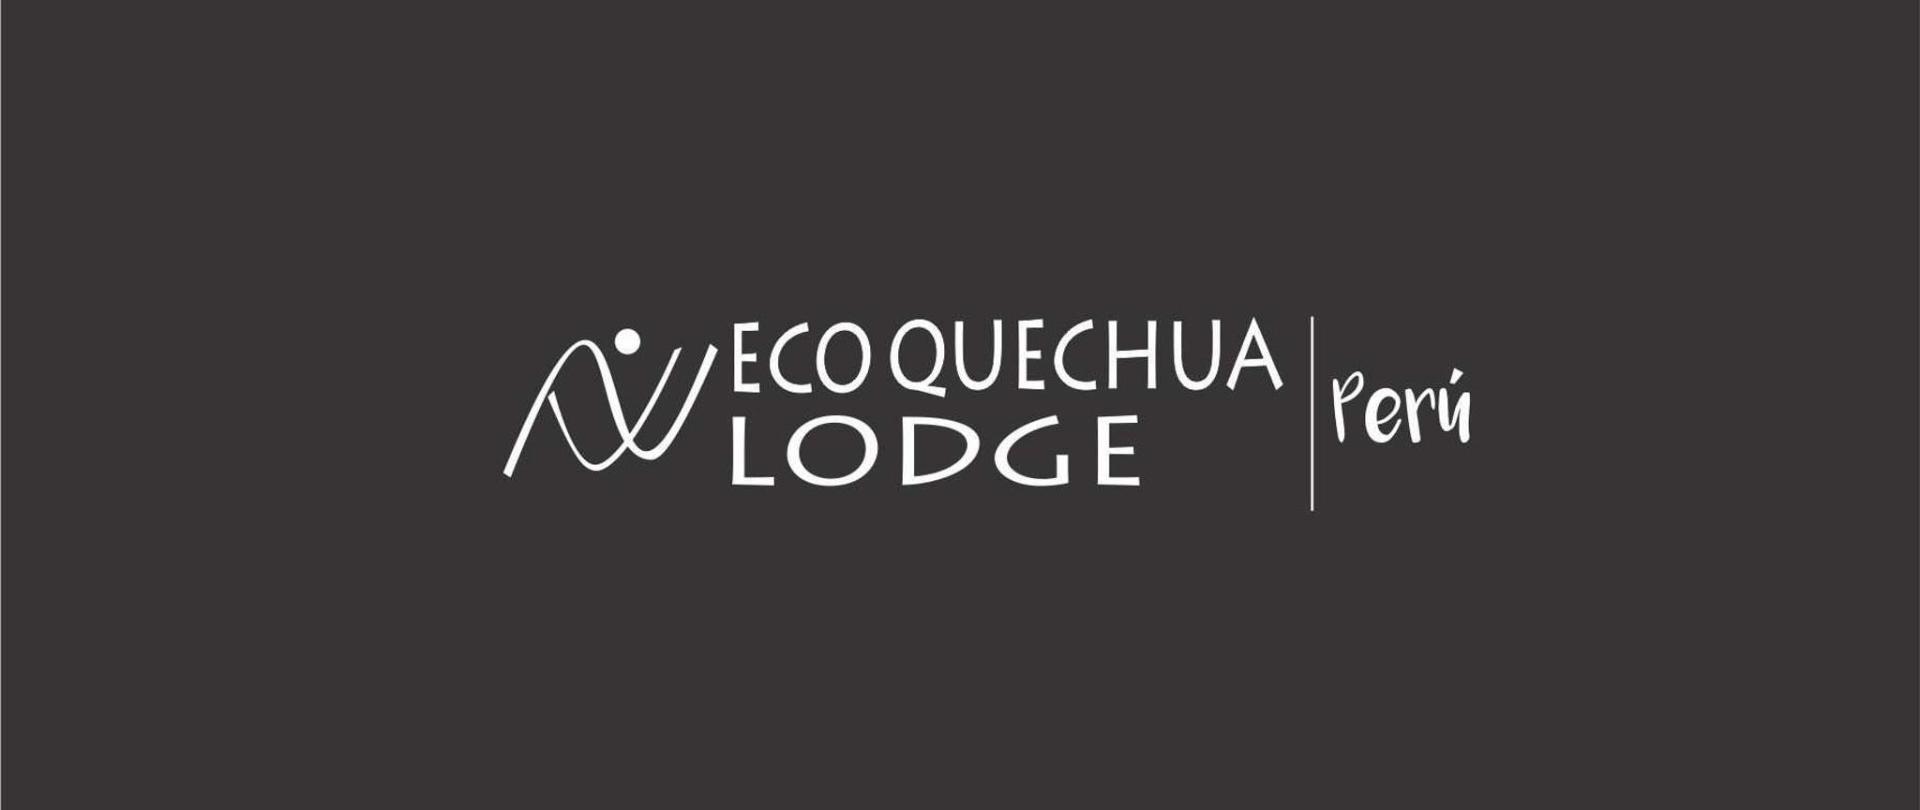 new-logo-eql5.jpg